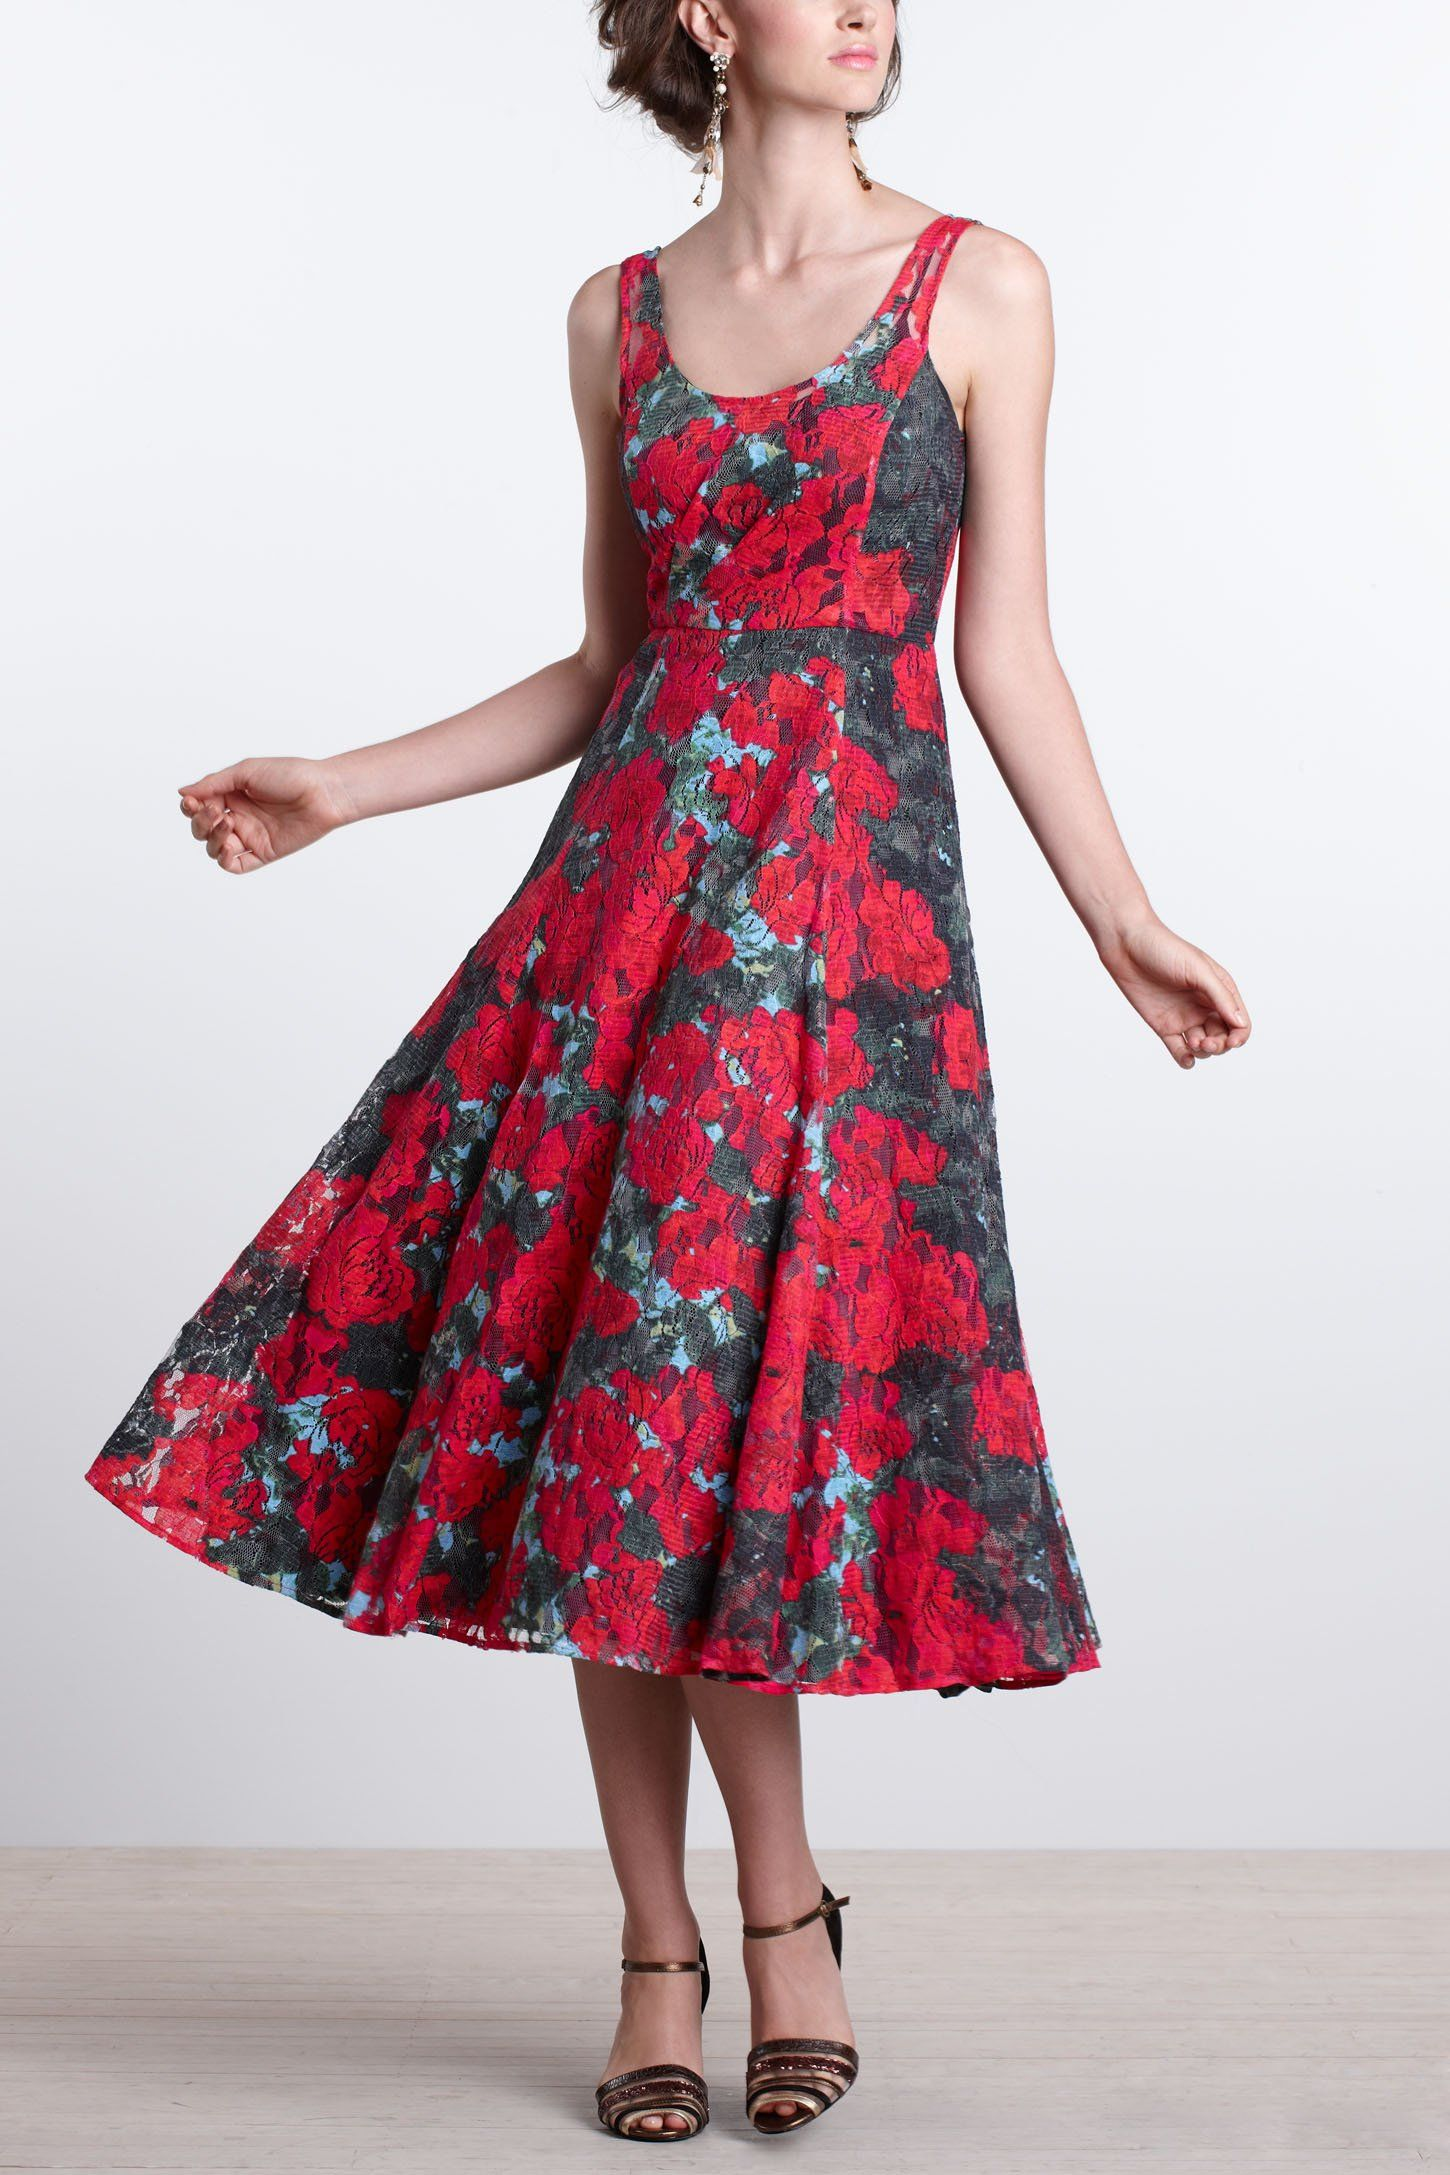 38++ Anthropologie red rose dress trends